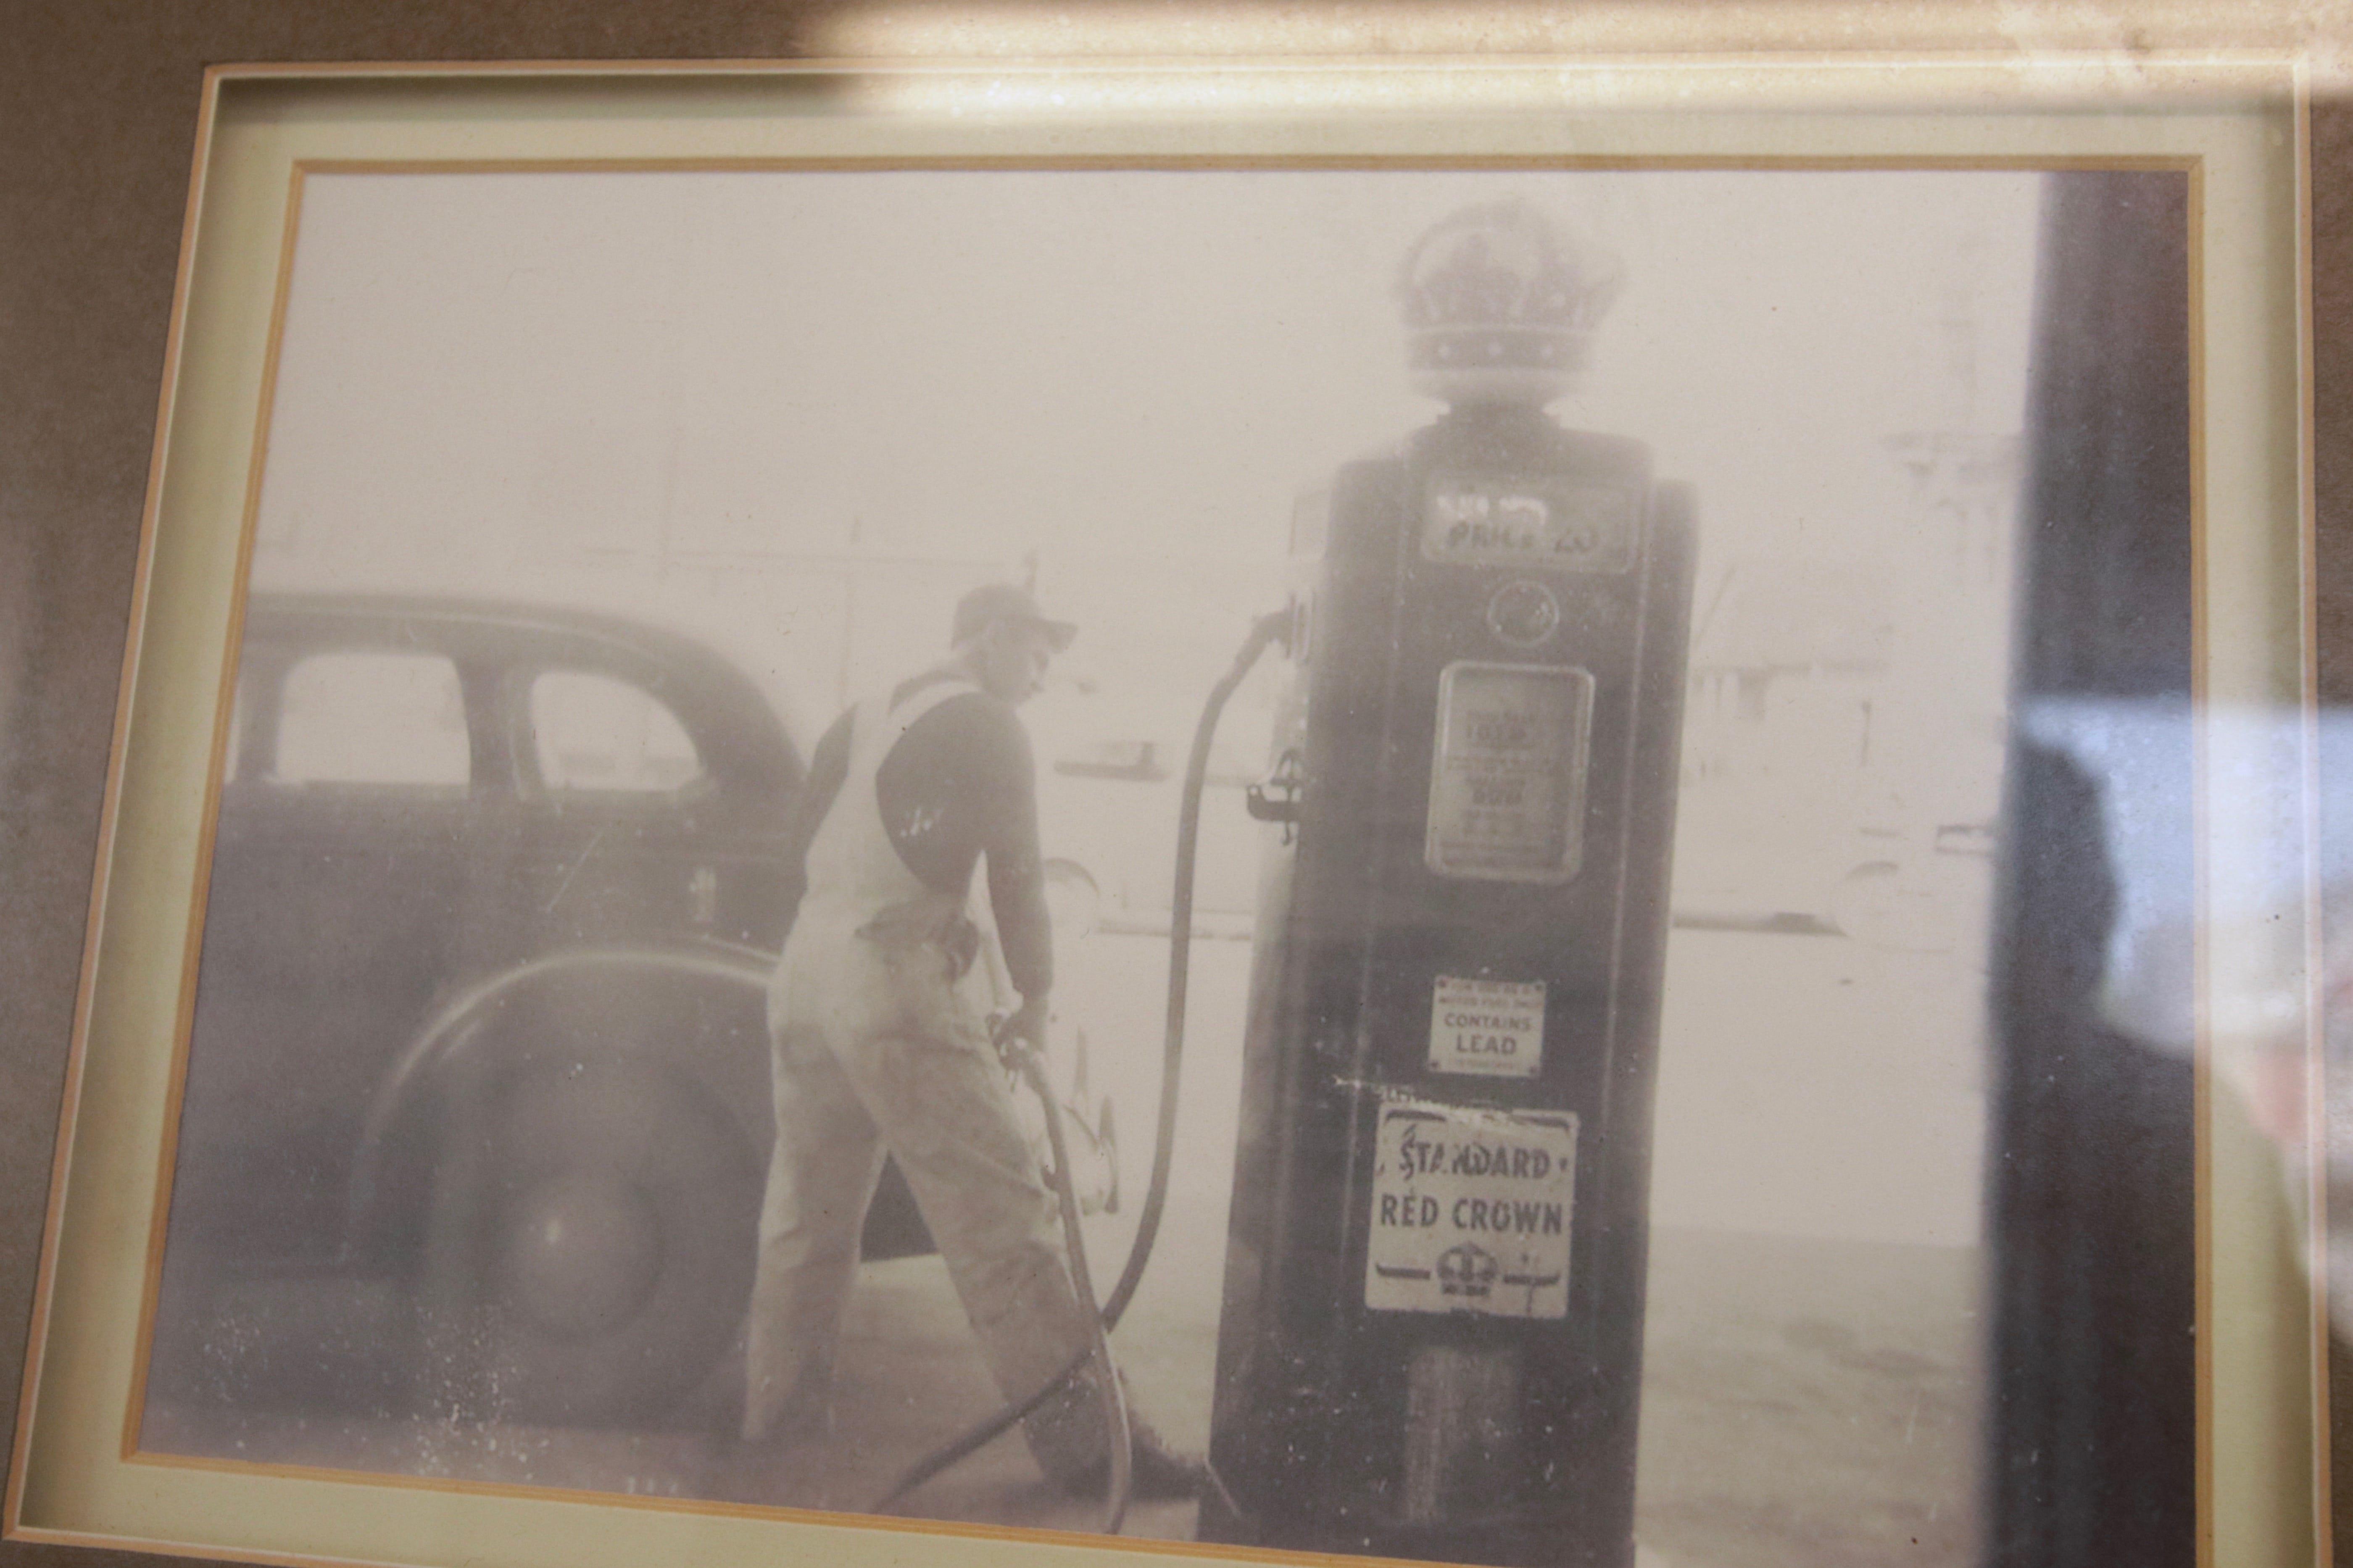 John Glasgow pumped Standard Oil Red Crown gas into a car.